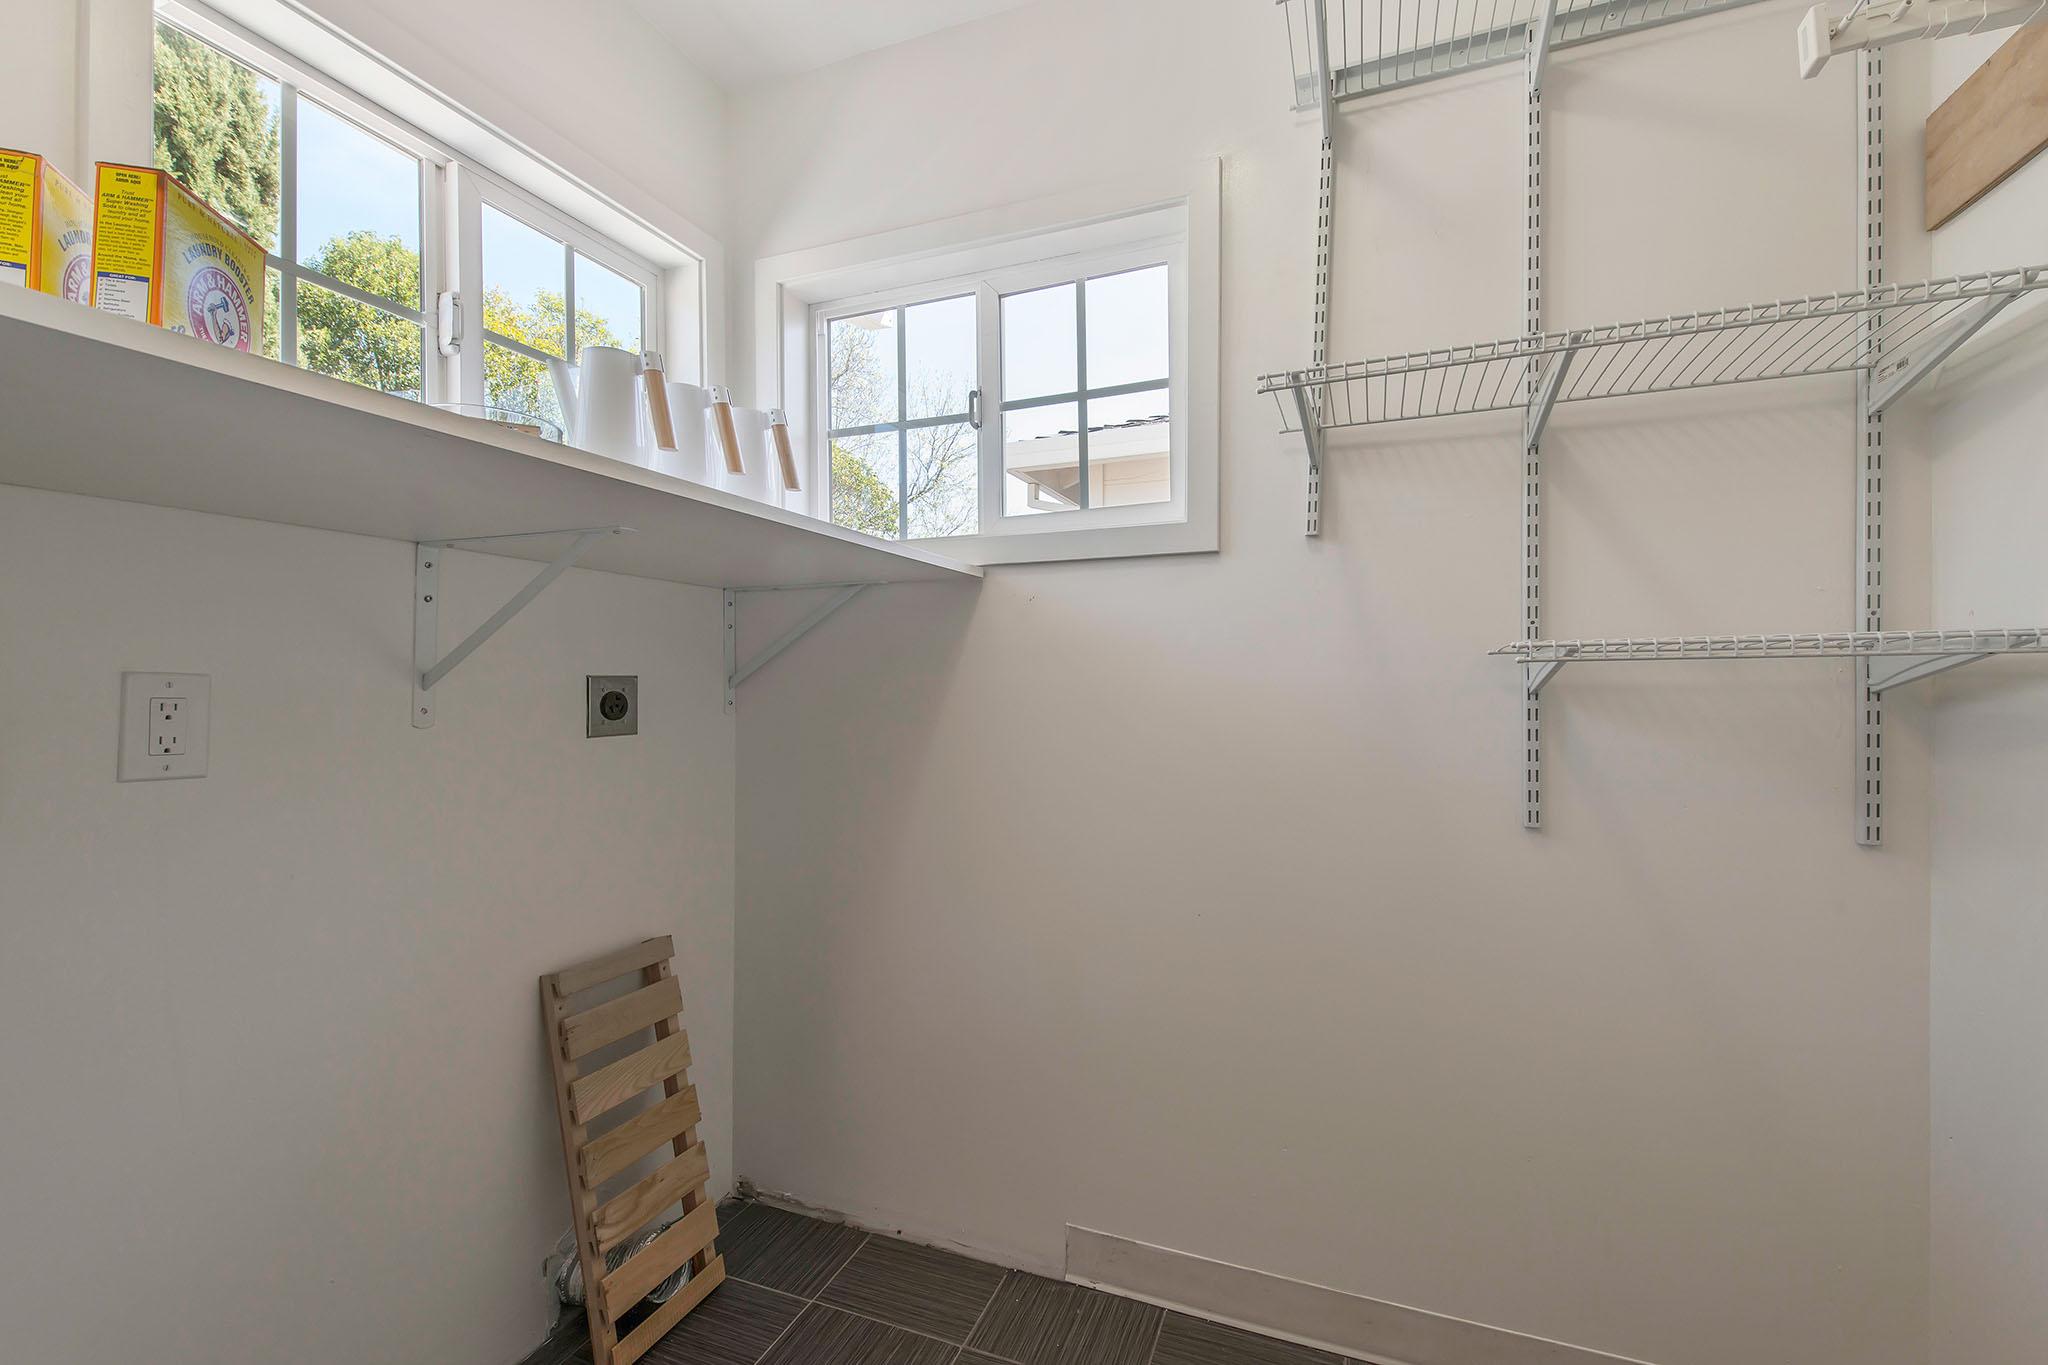 Kitchen 3 - pantry.jpg